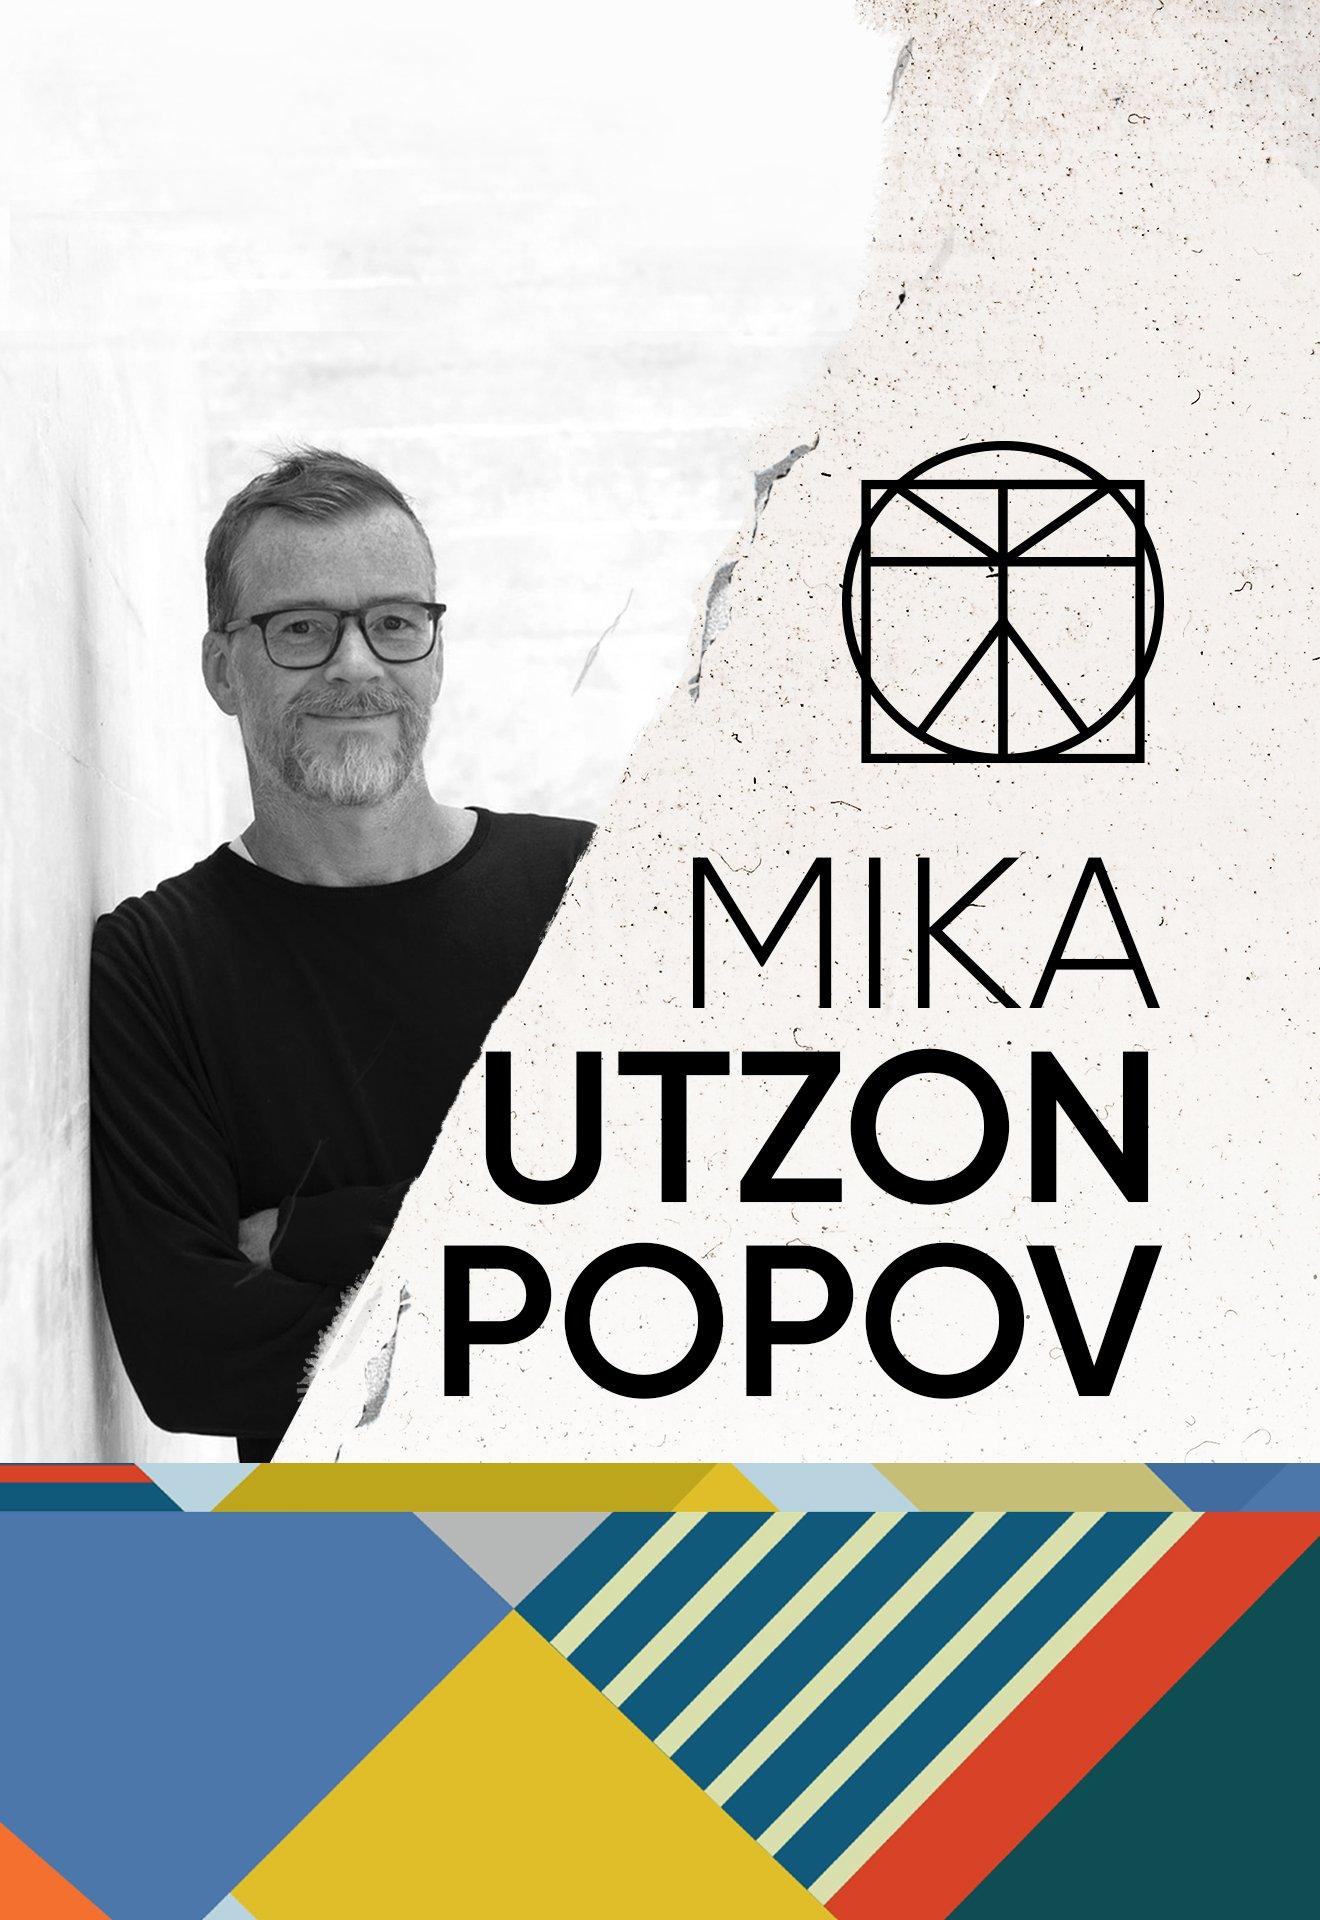 Mika Utzon Popov Artist 2nd Renaissance